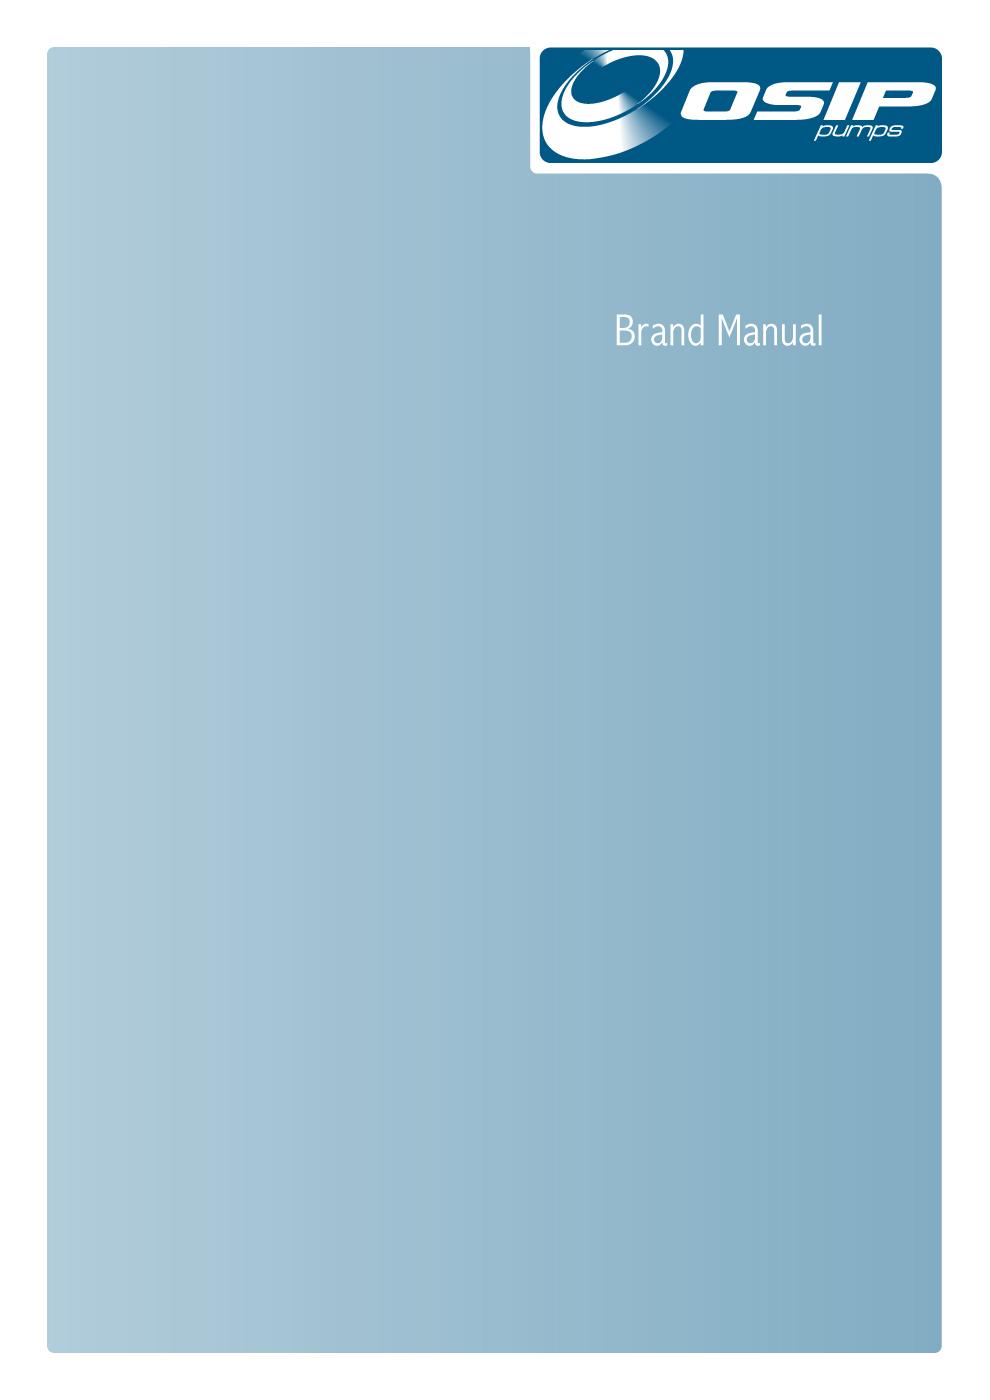 Corporate image-immagine coordinata aziendale: Manuale Operativo-Brand Manual OSIP